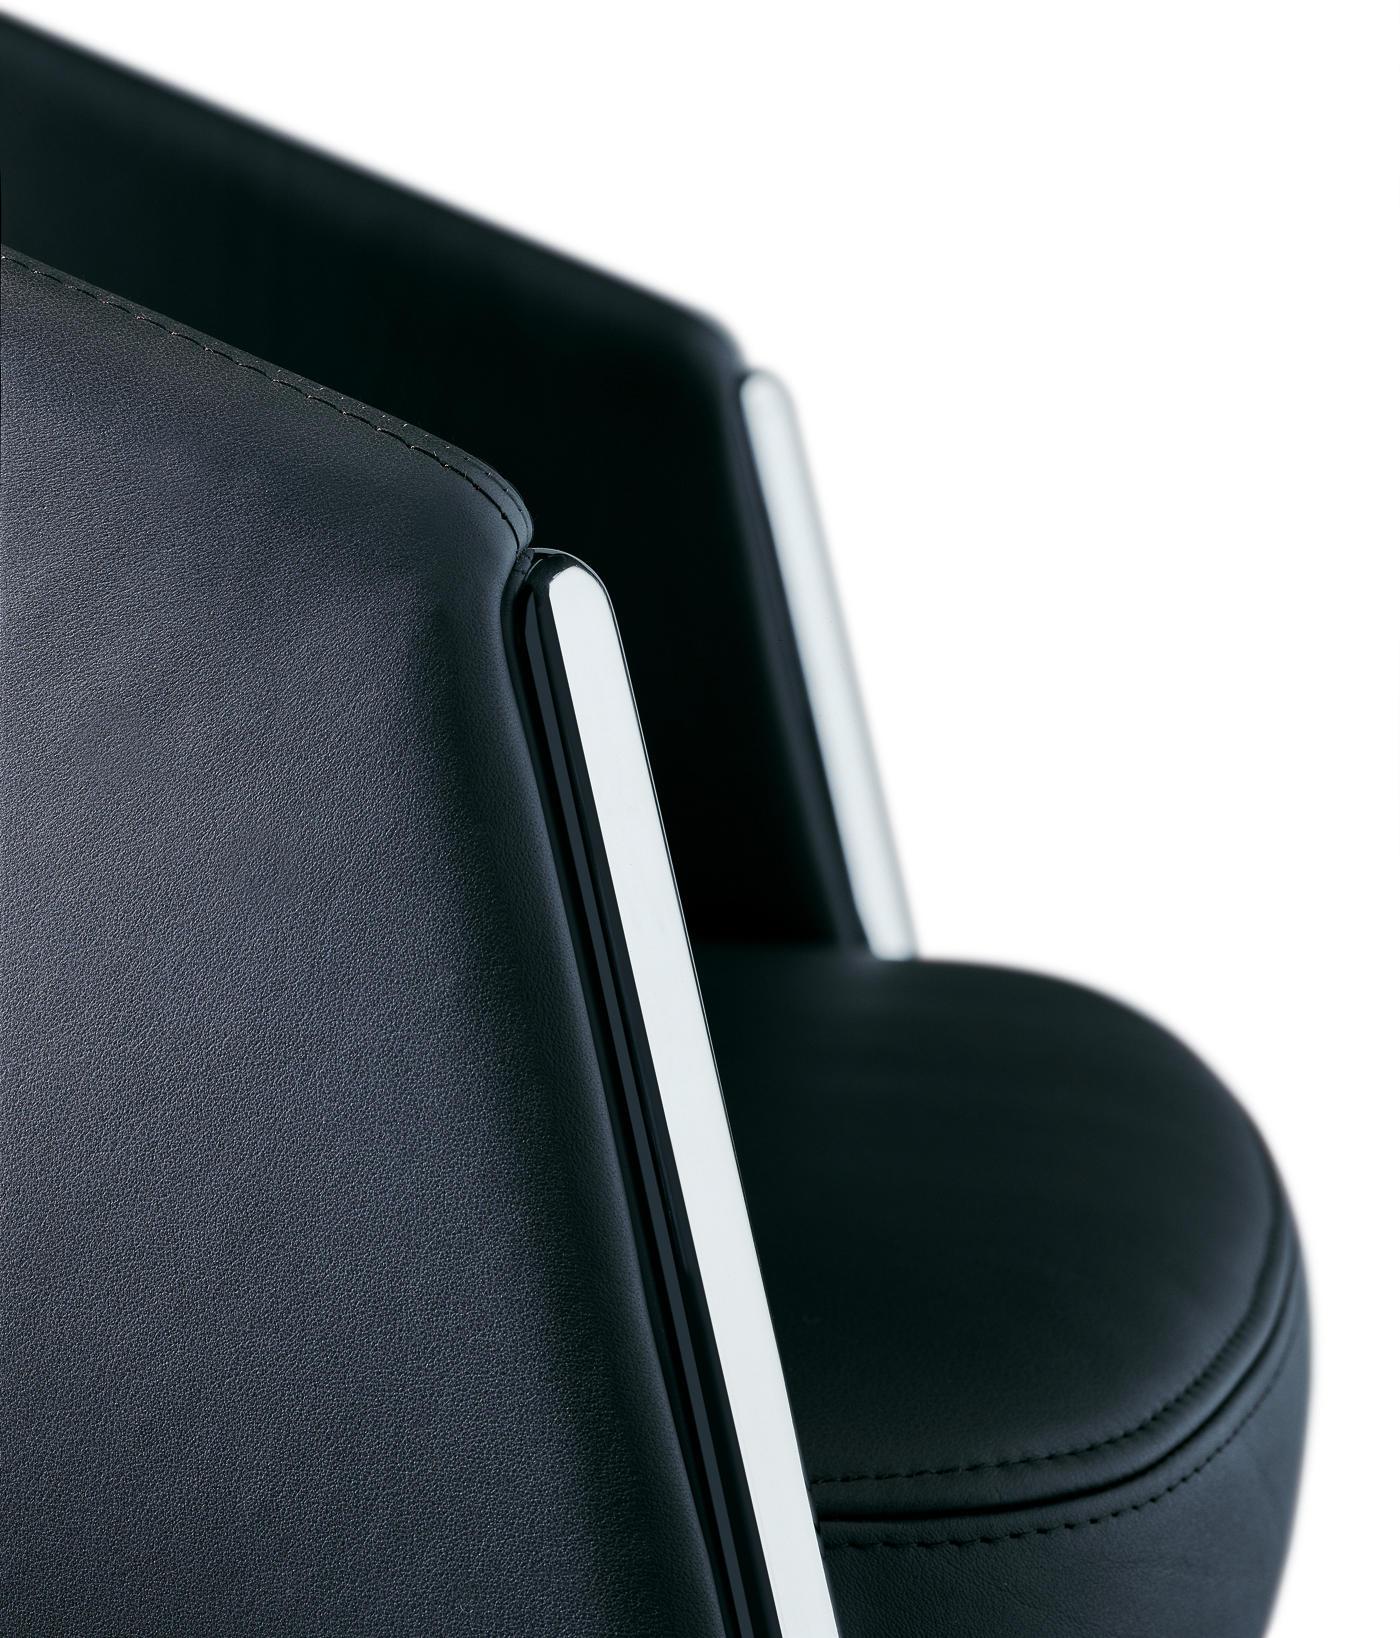 silent rush sedie girevoli dirigenziali sedus stoll architonic. Black Bedroom Furniture Sets. Home Design Ideas